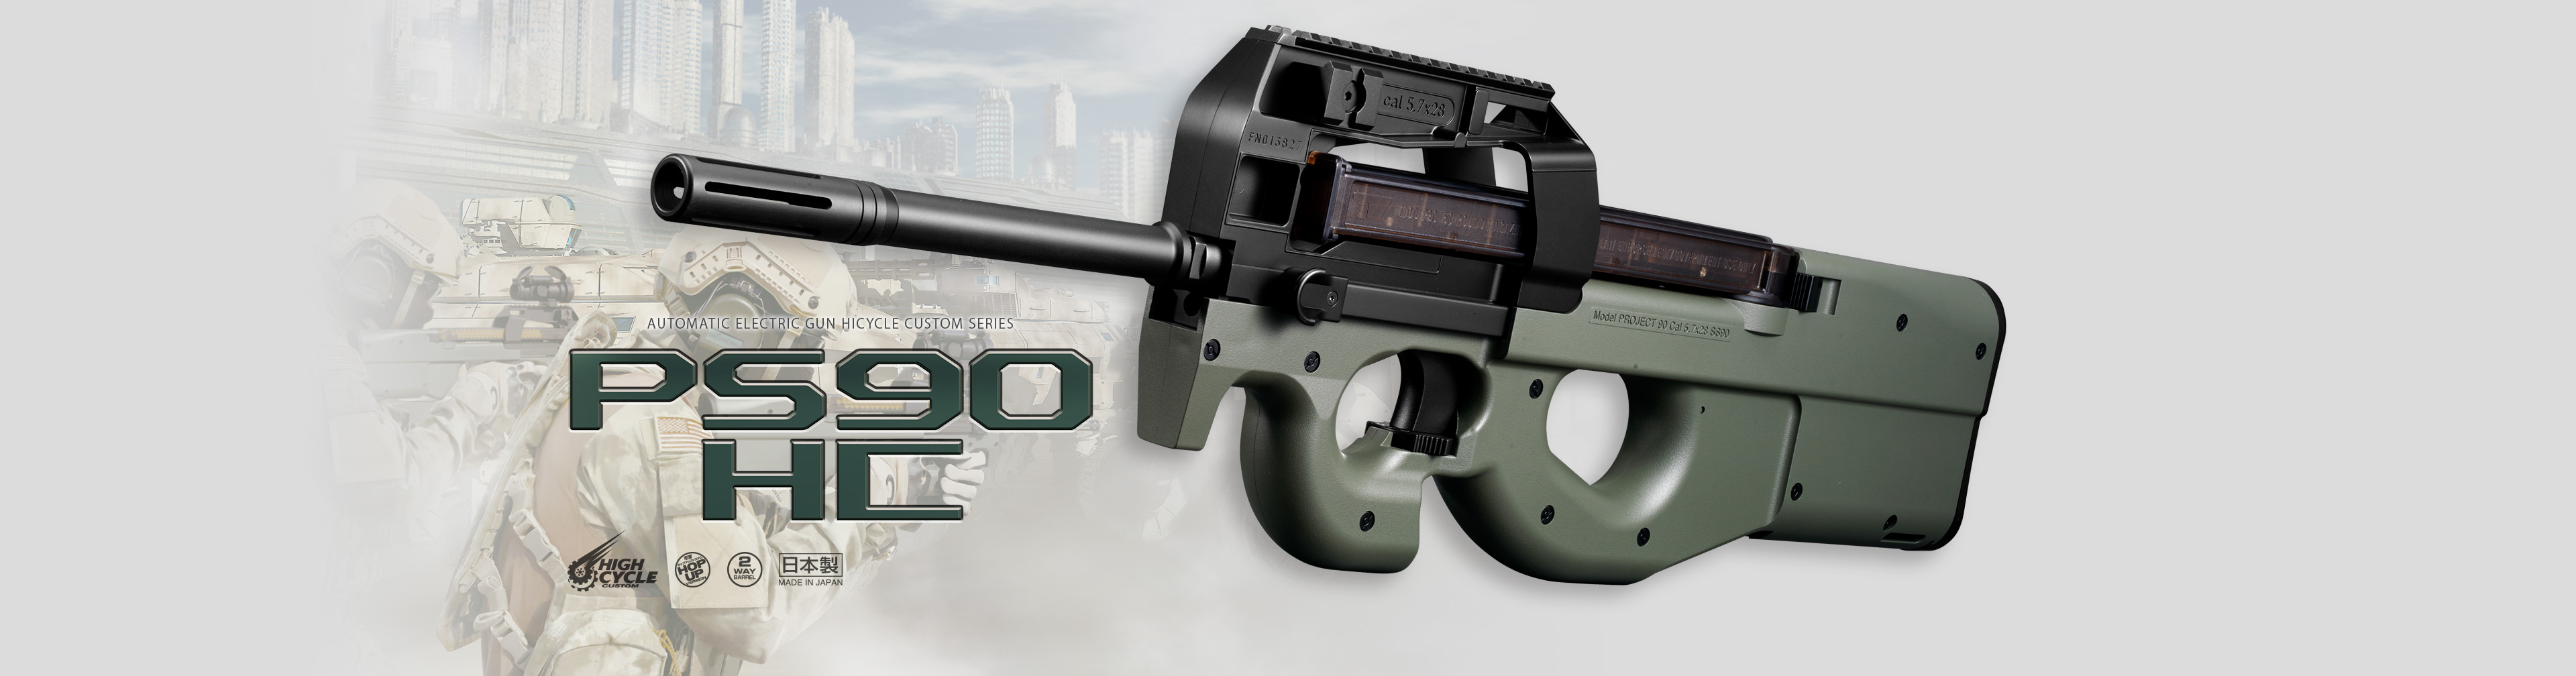 PS90 HC